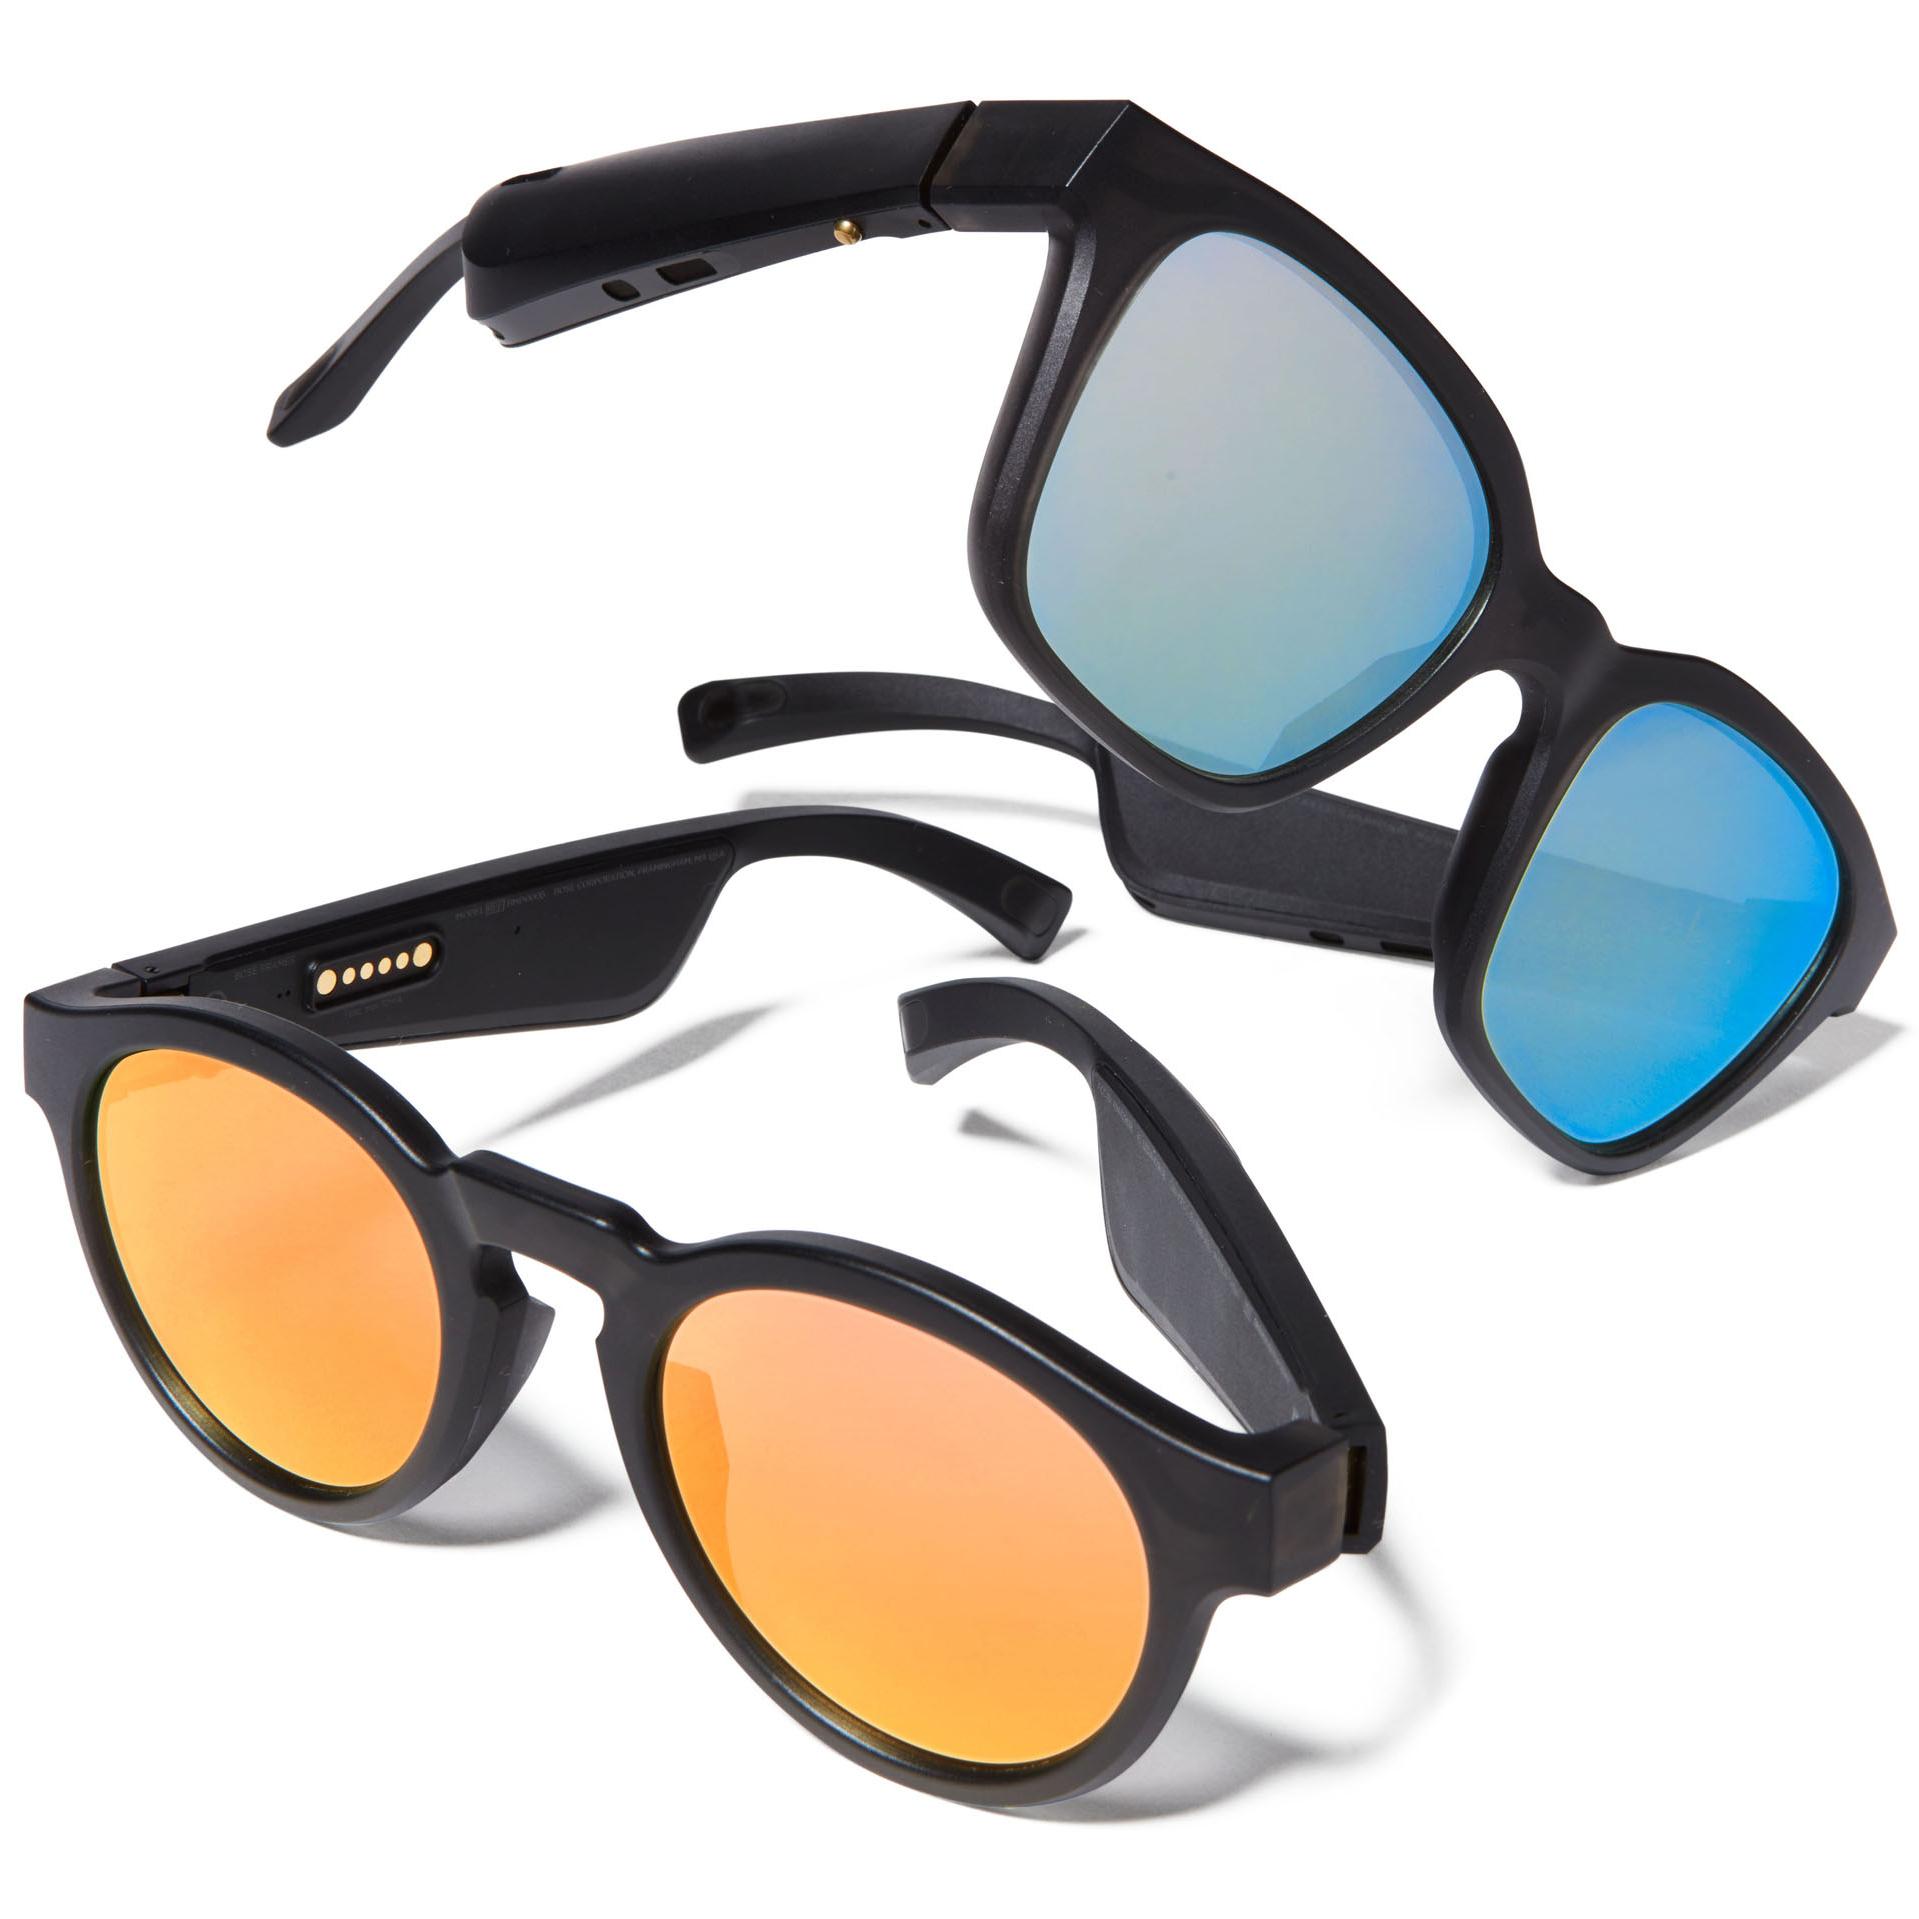 two pairs of bose speaker sunglasses